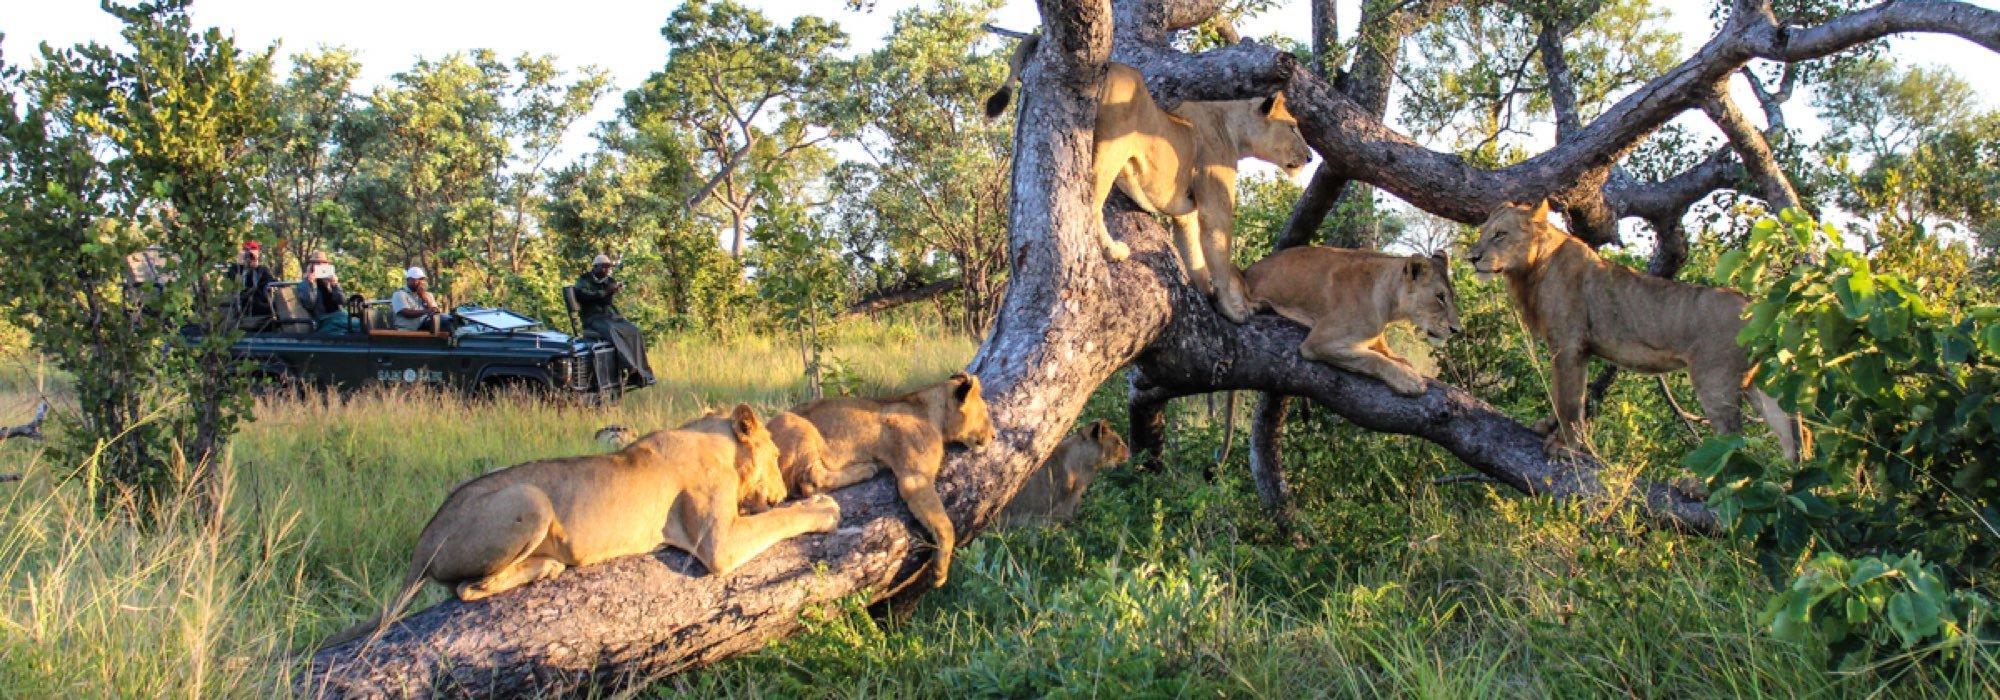 Lions at Sabi Sabi